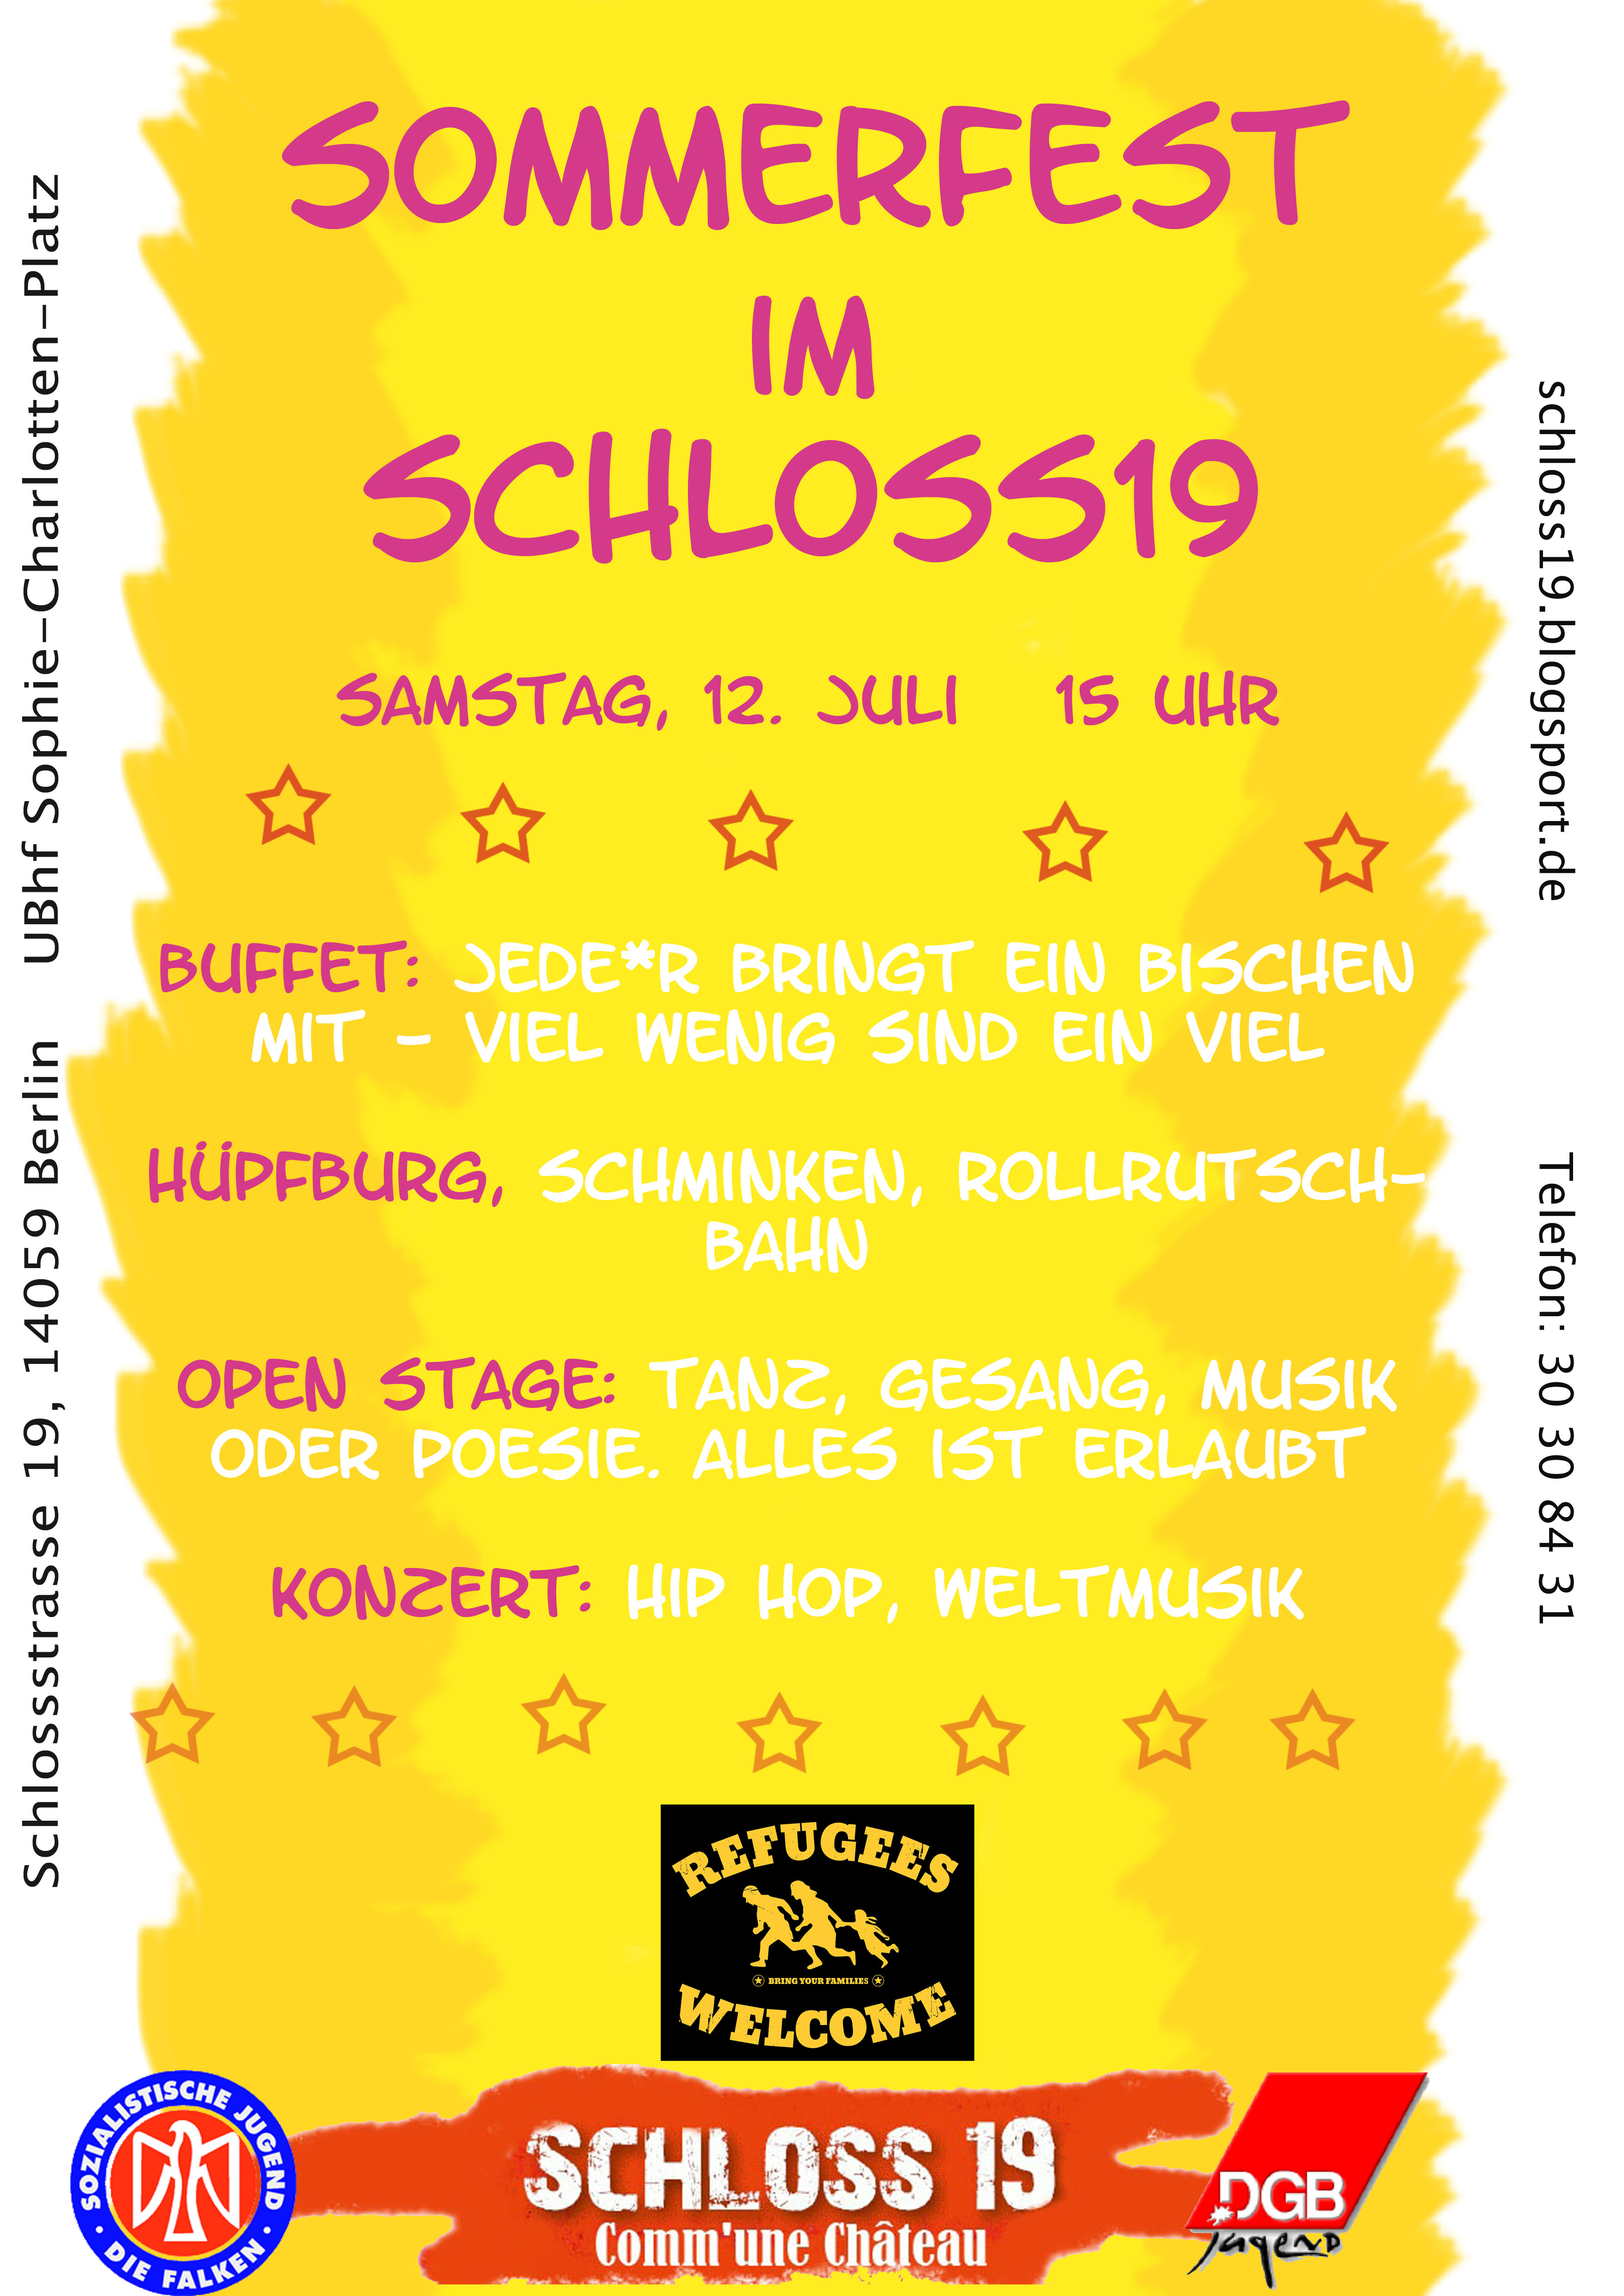 Sommerfest Schloss19 - comm'une château